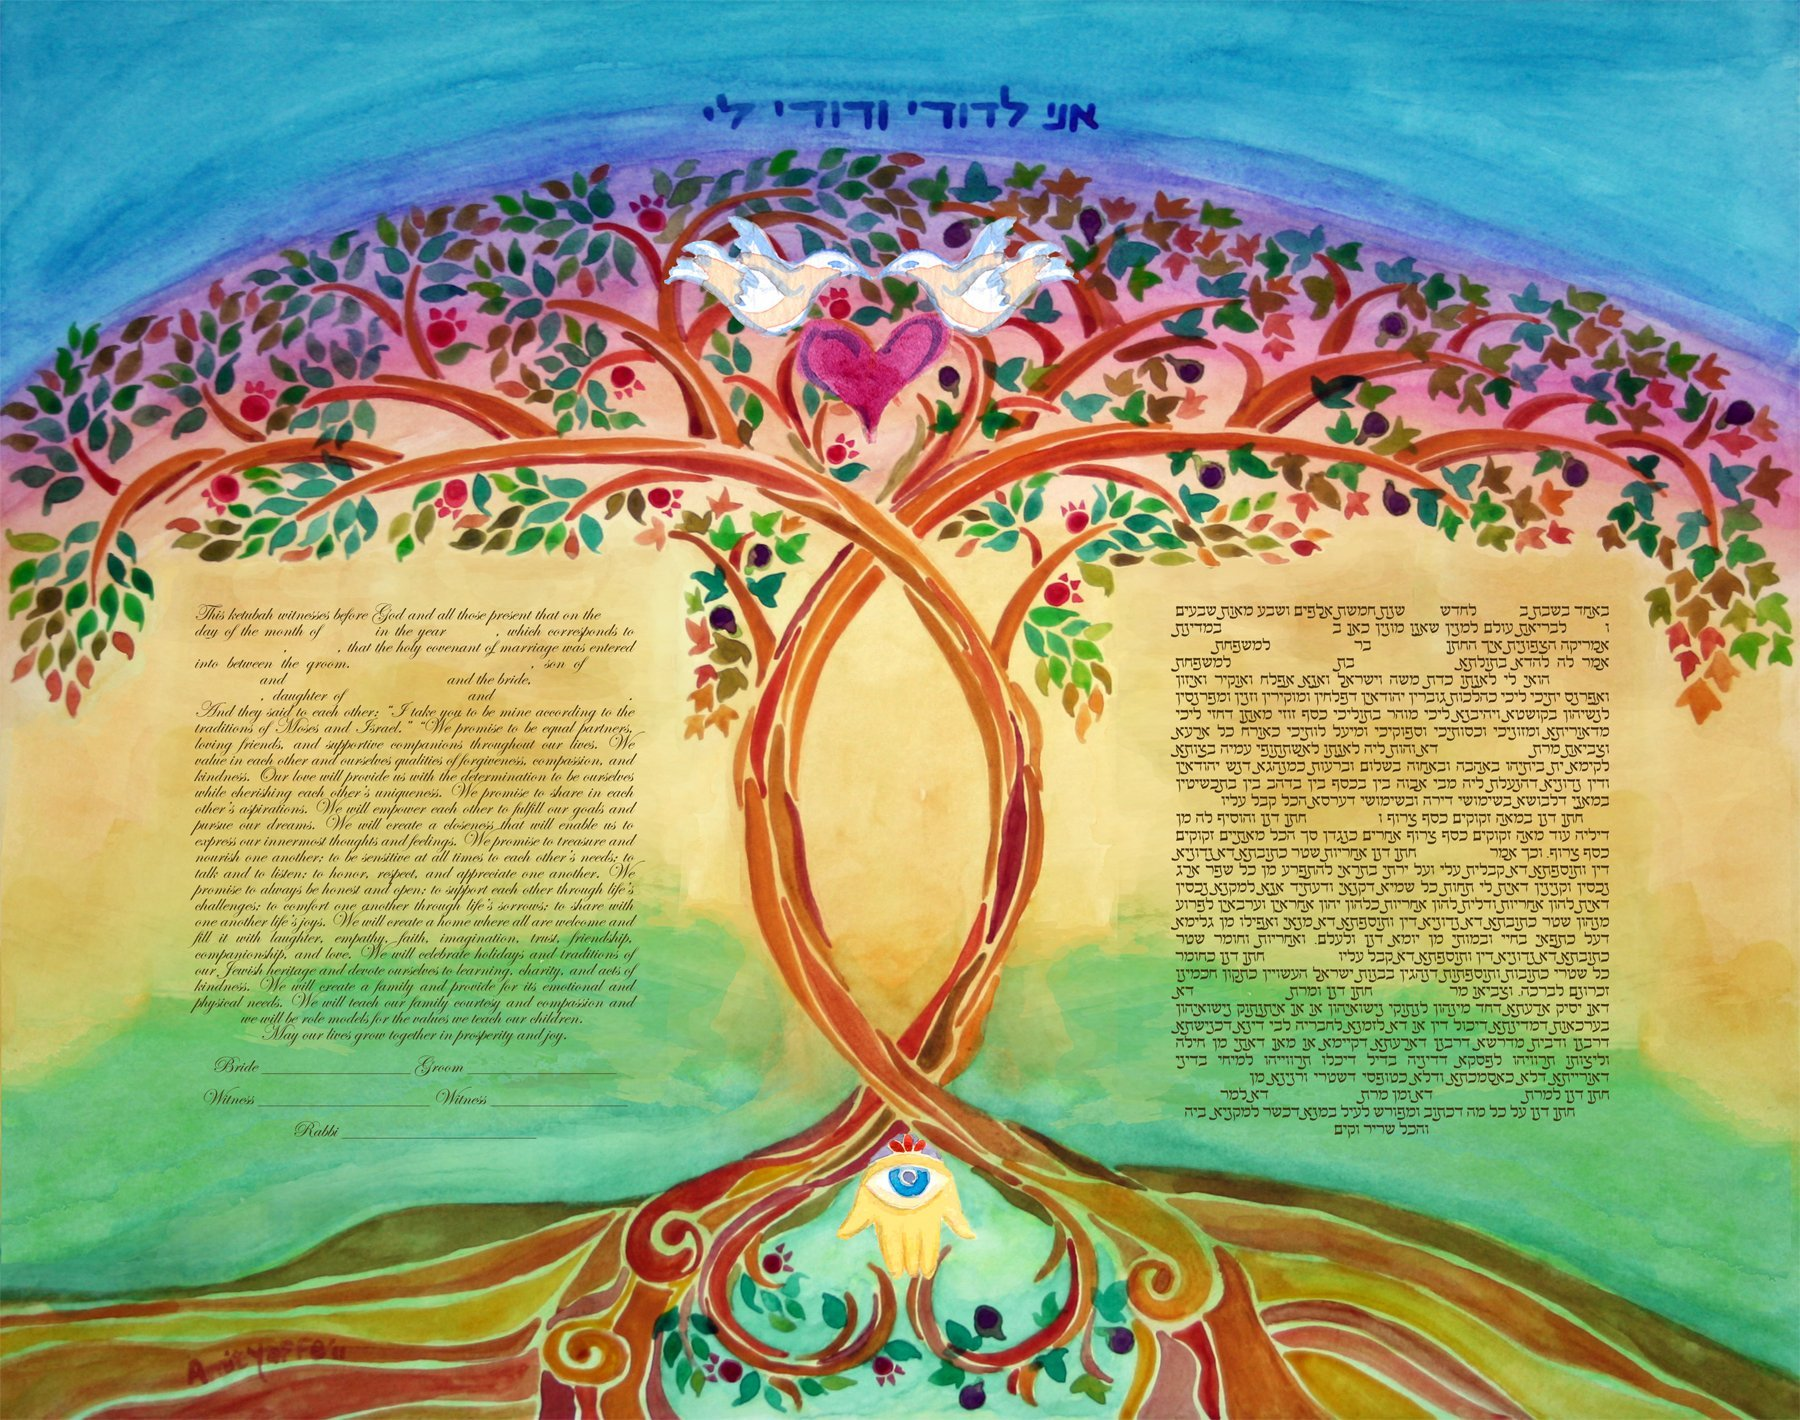 Custom Ketubah - Jewish Wedding Contract - Personalized Ketubah - Jewish Judaica Art - Hebrew English - Love Birds on Linked Trees